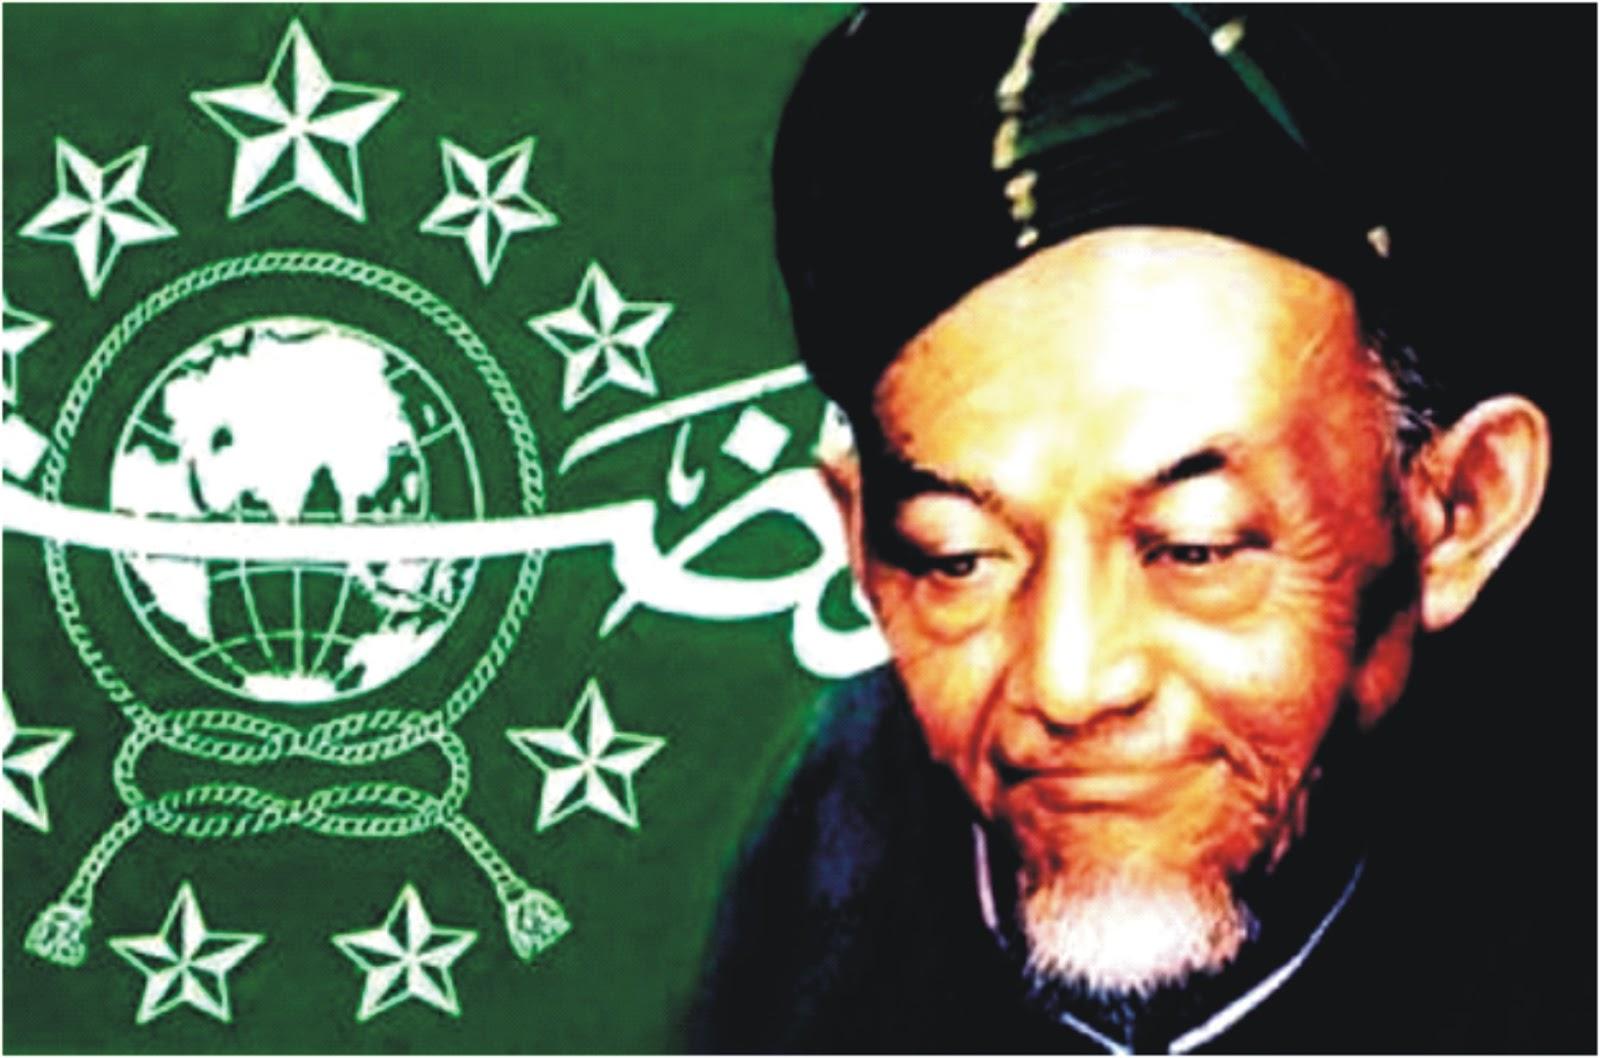 GreenNotes: Kisah Inspiratif: KH. Hasyim Asy'ari